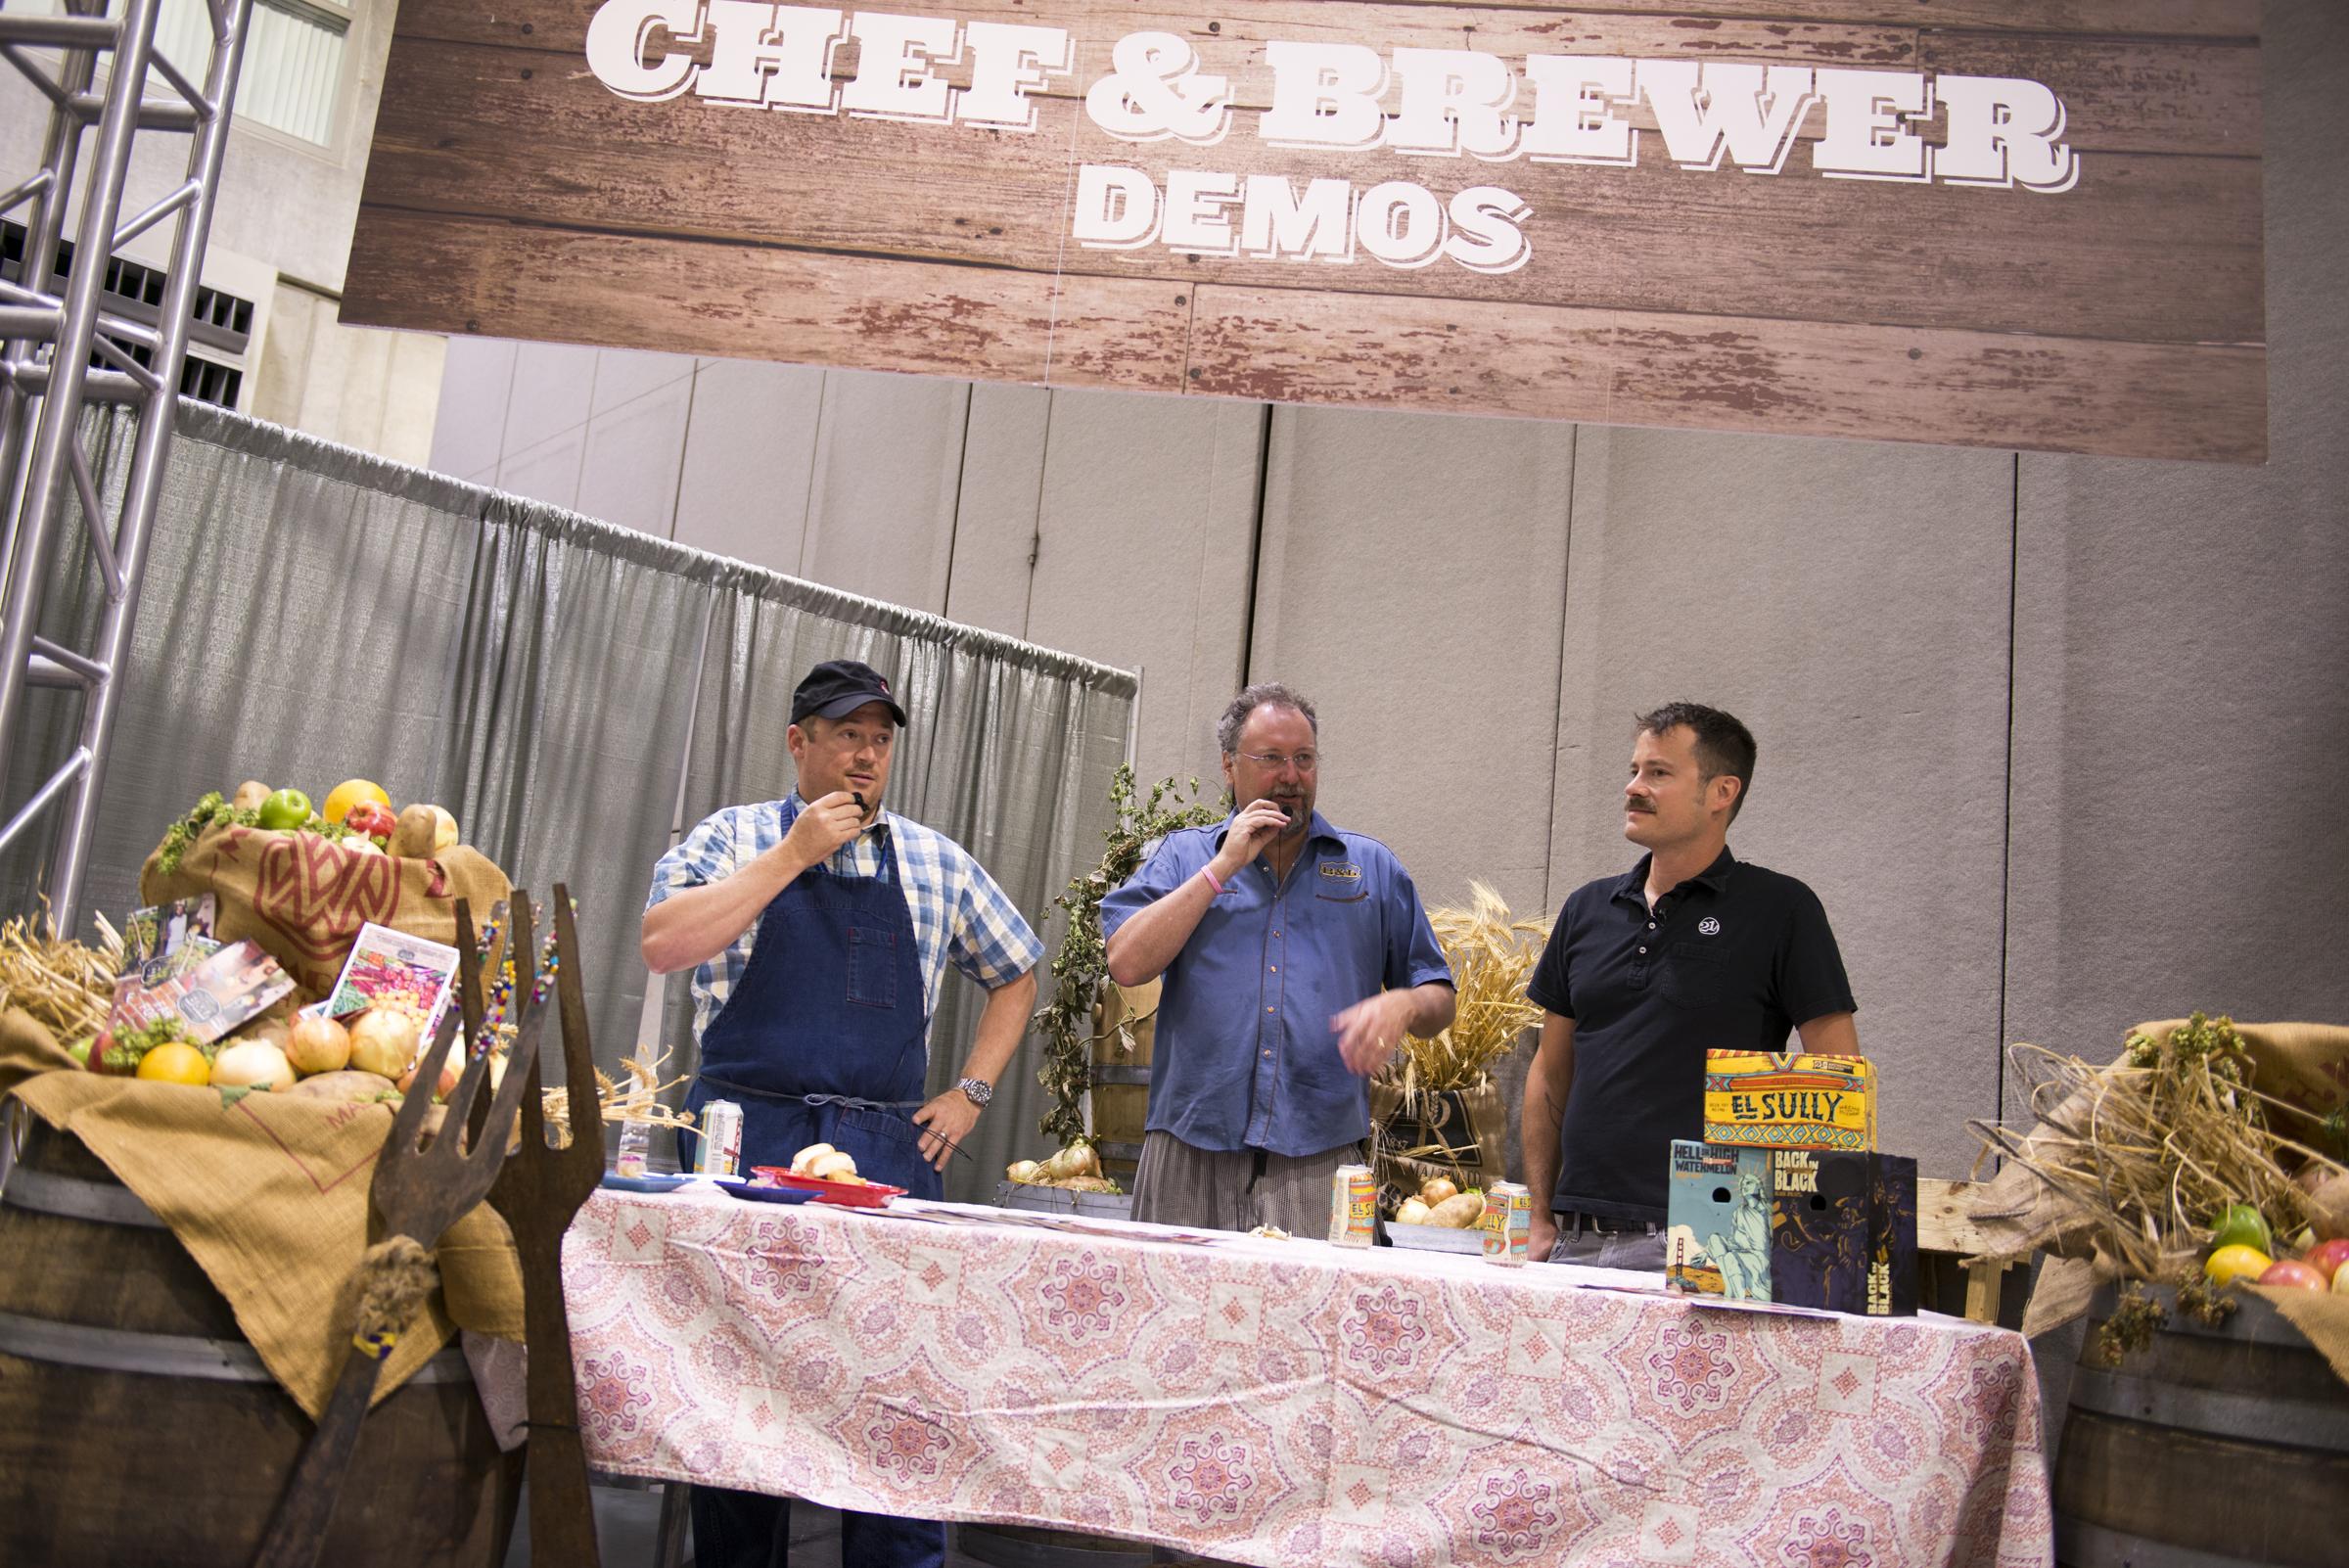 At the Summit: Artisan Food and Beer Pairings